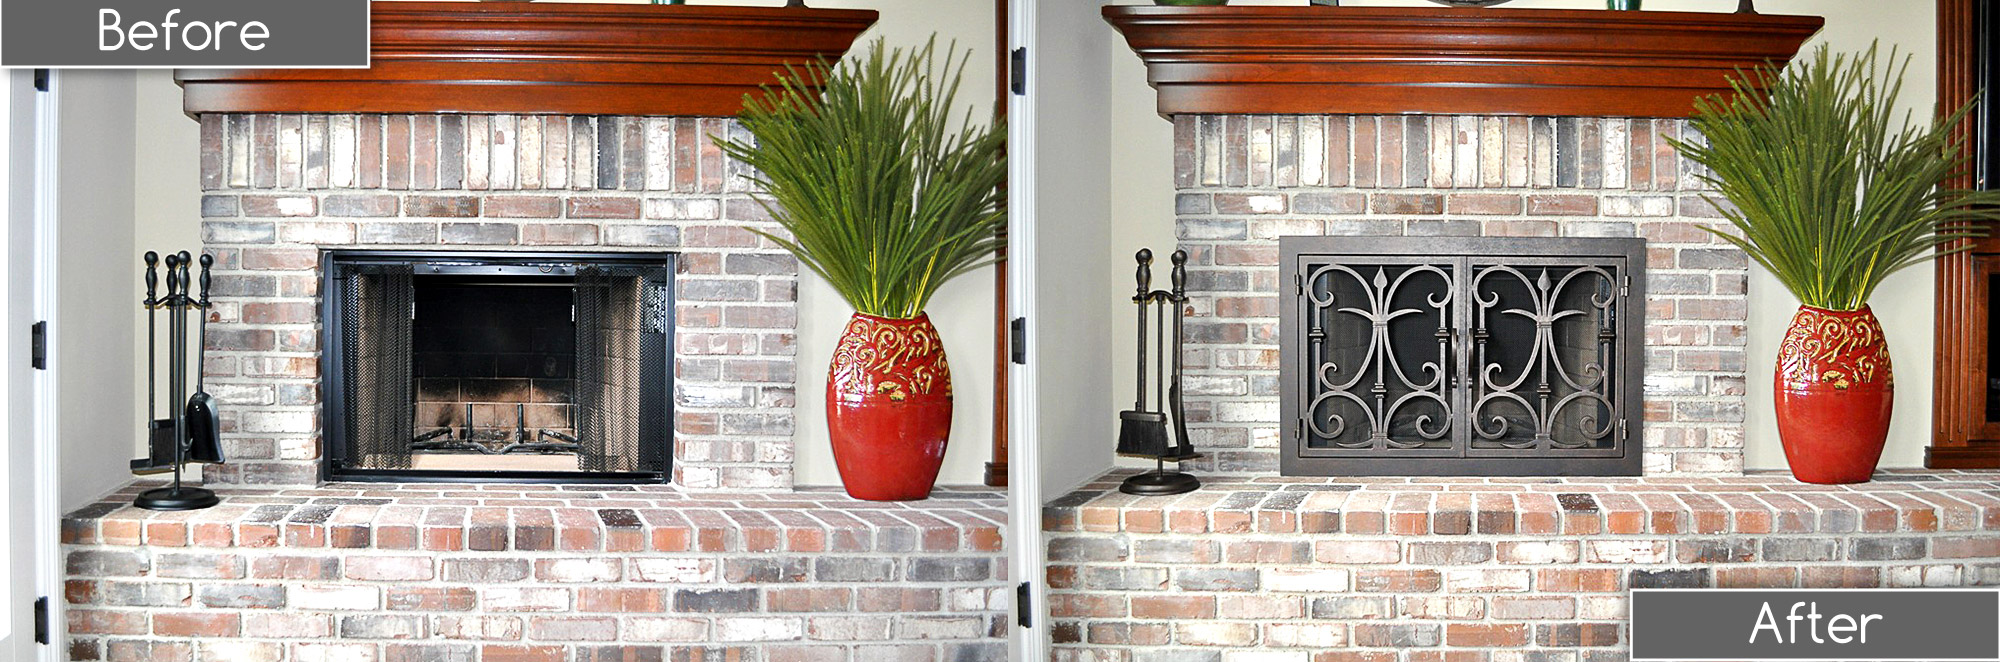 Rectangular Fireplace Door Before After